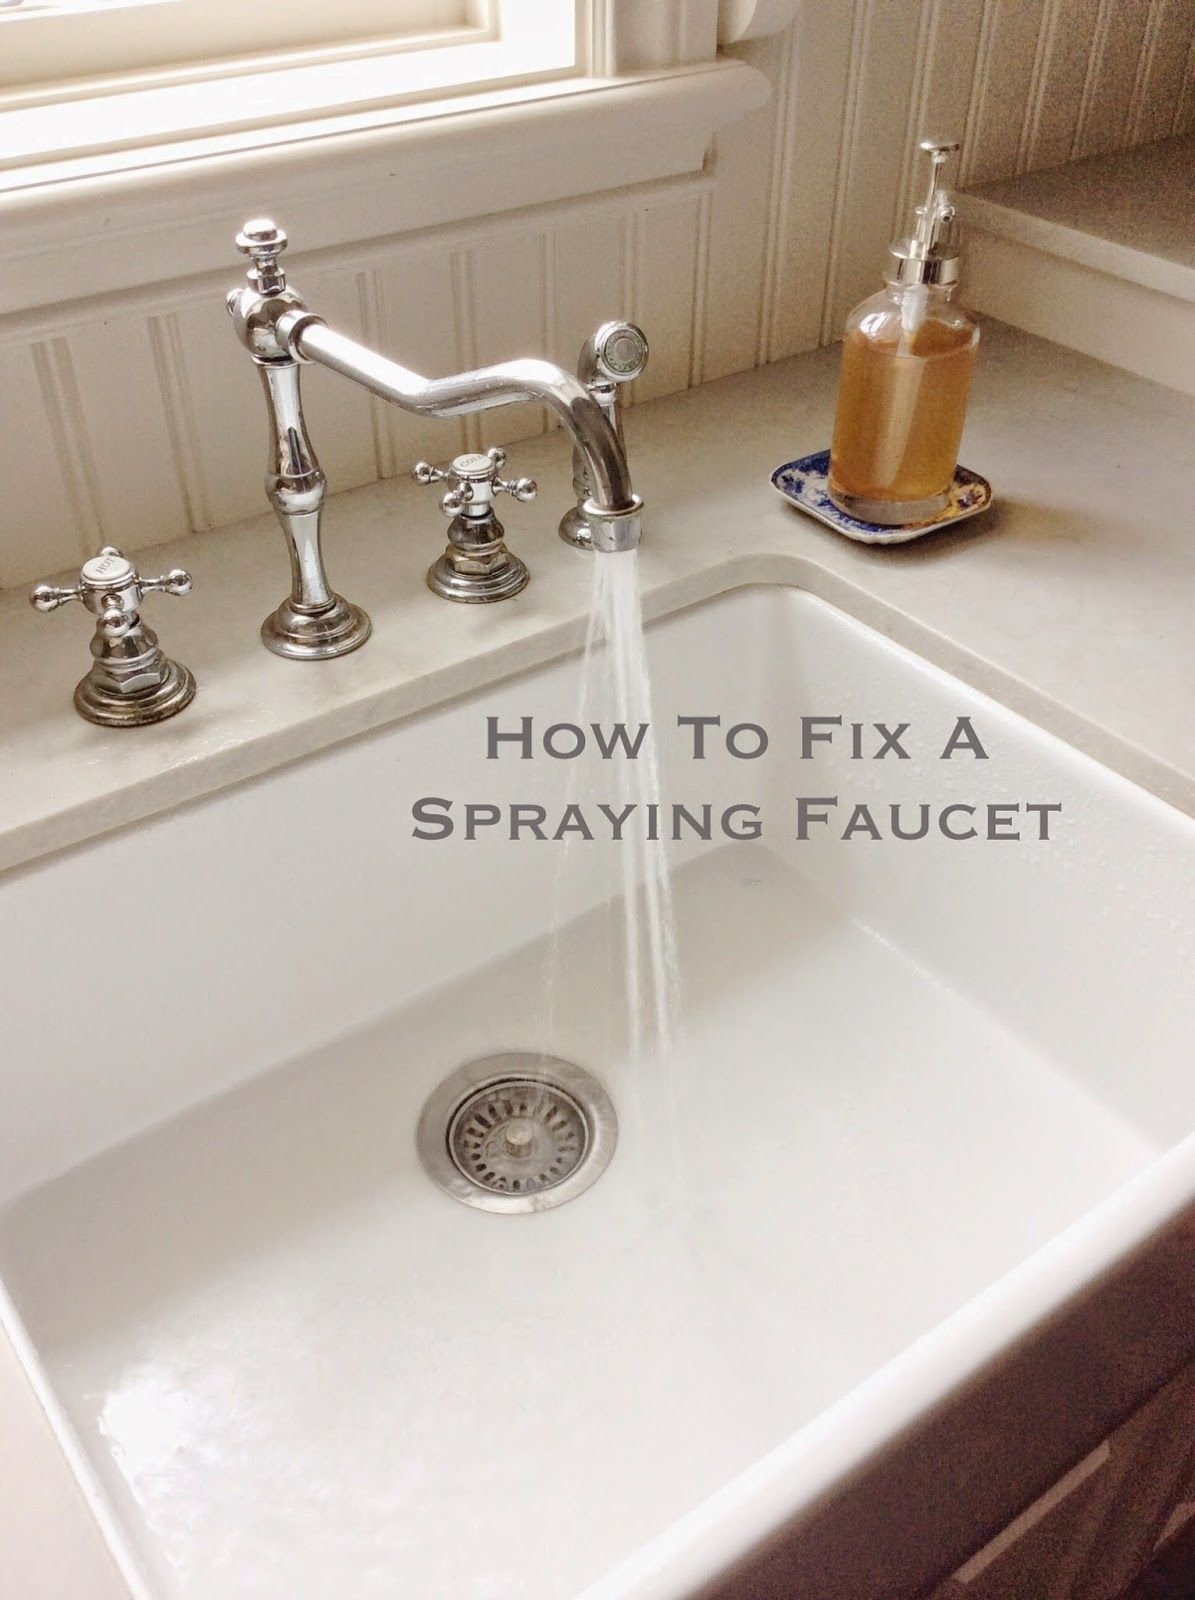 How To Fix A Spraying Faucet Faucet Diy Home Repair Fix It